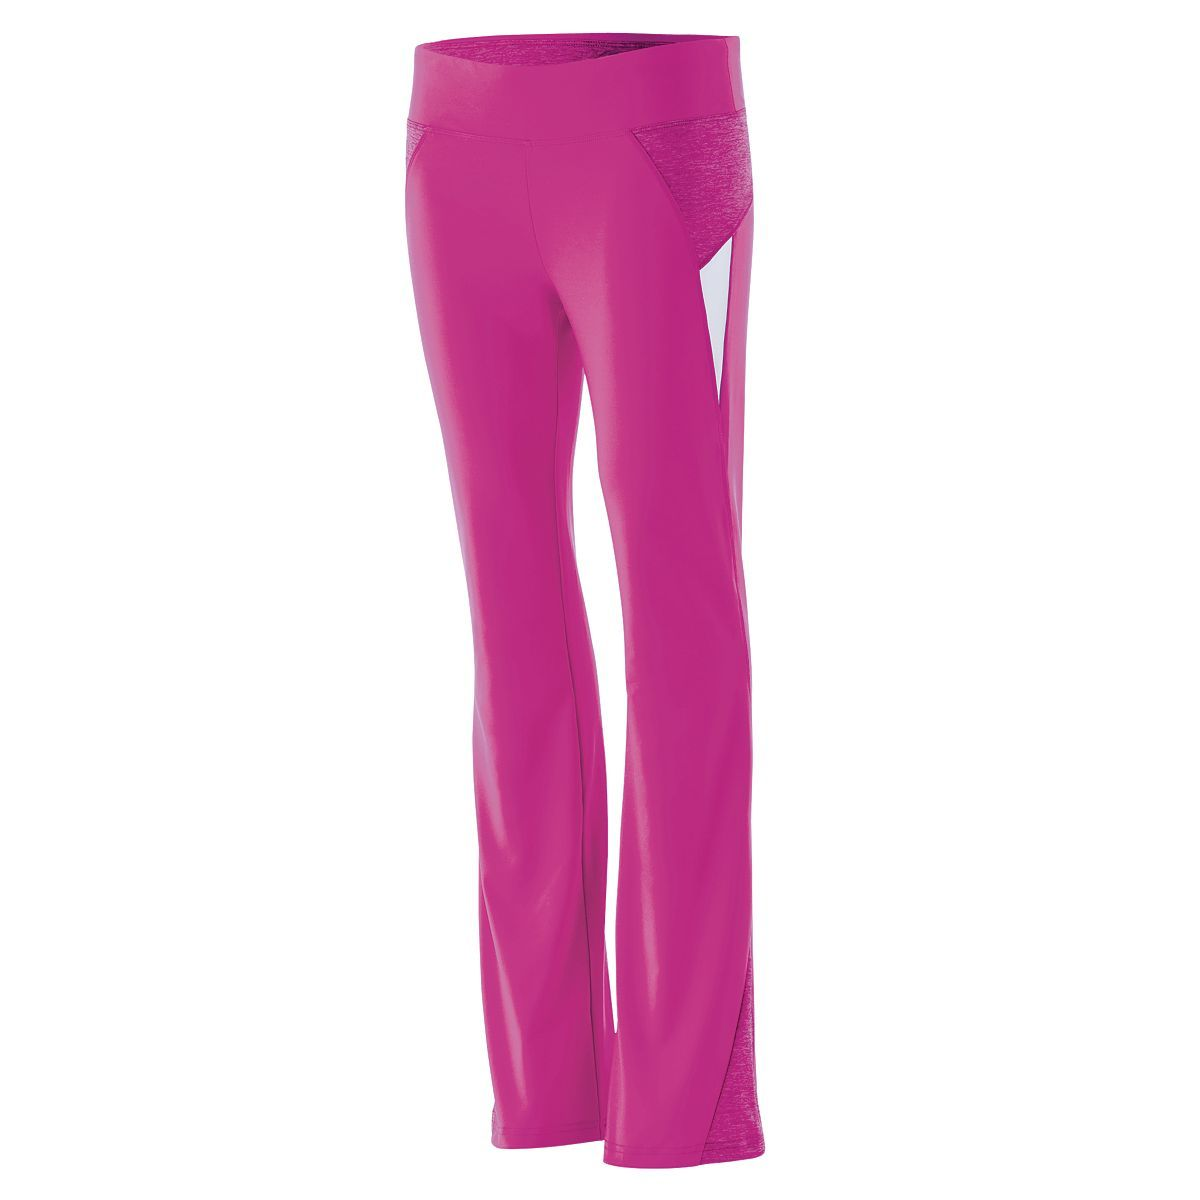 Ladies Tumble Pant - POWER PINK/PINK HEATHER/WHITE